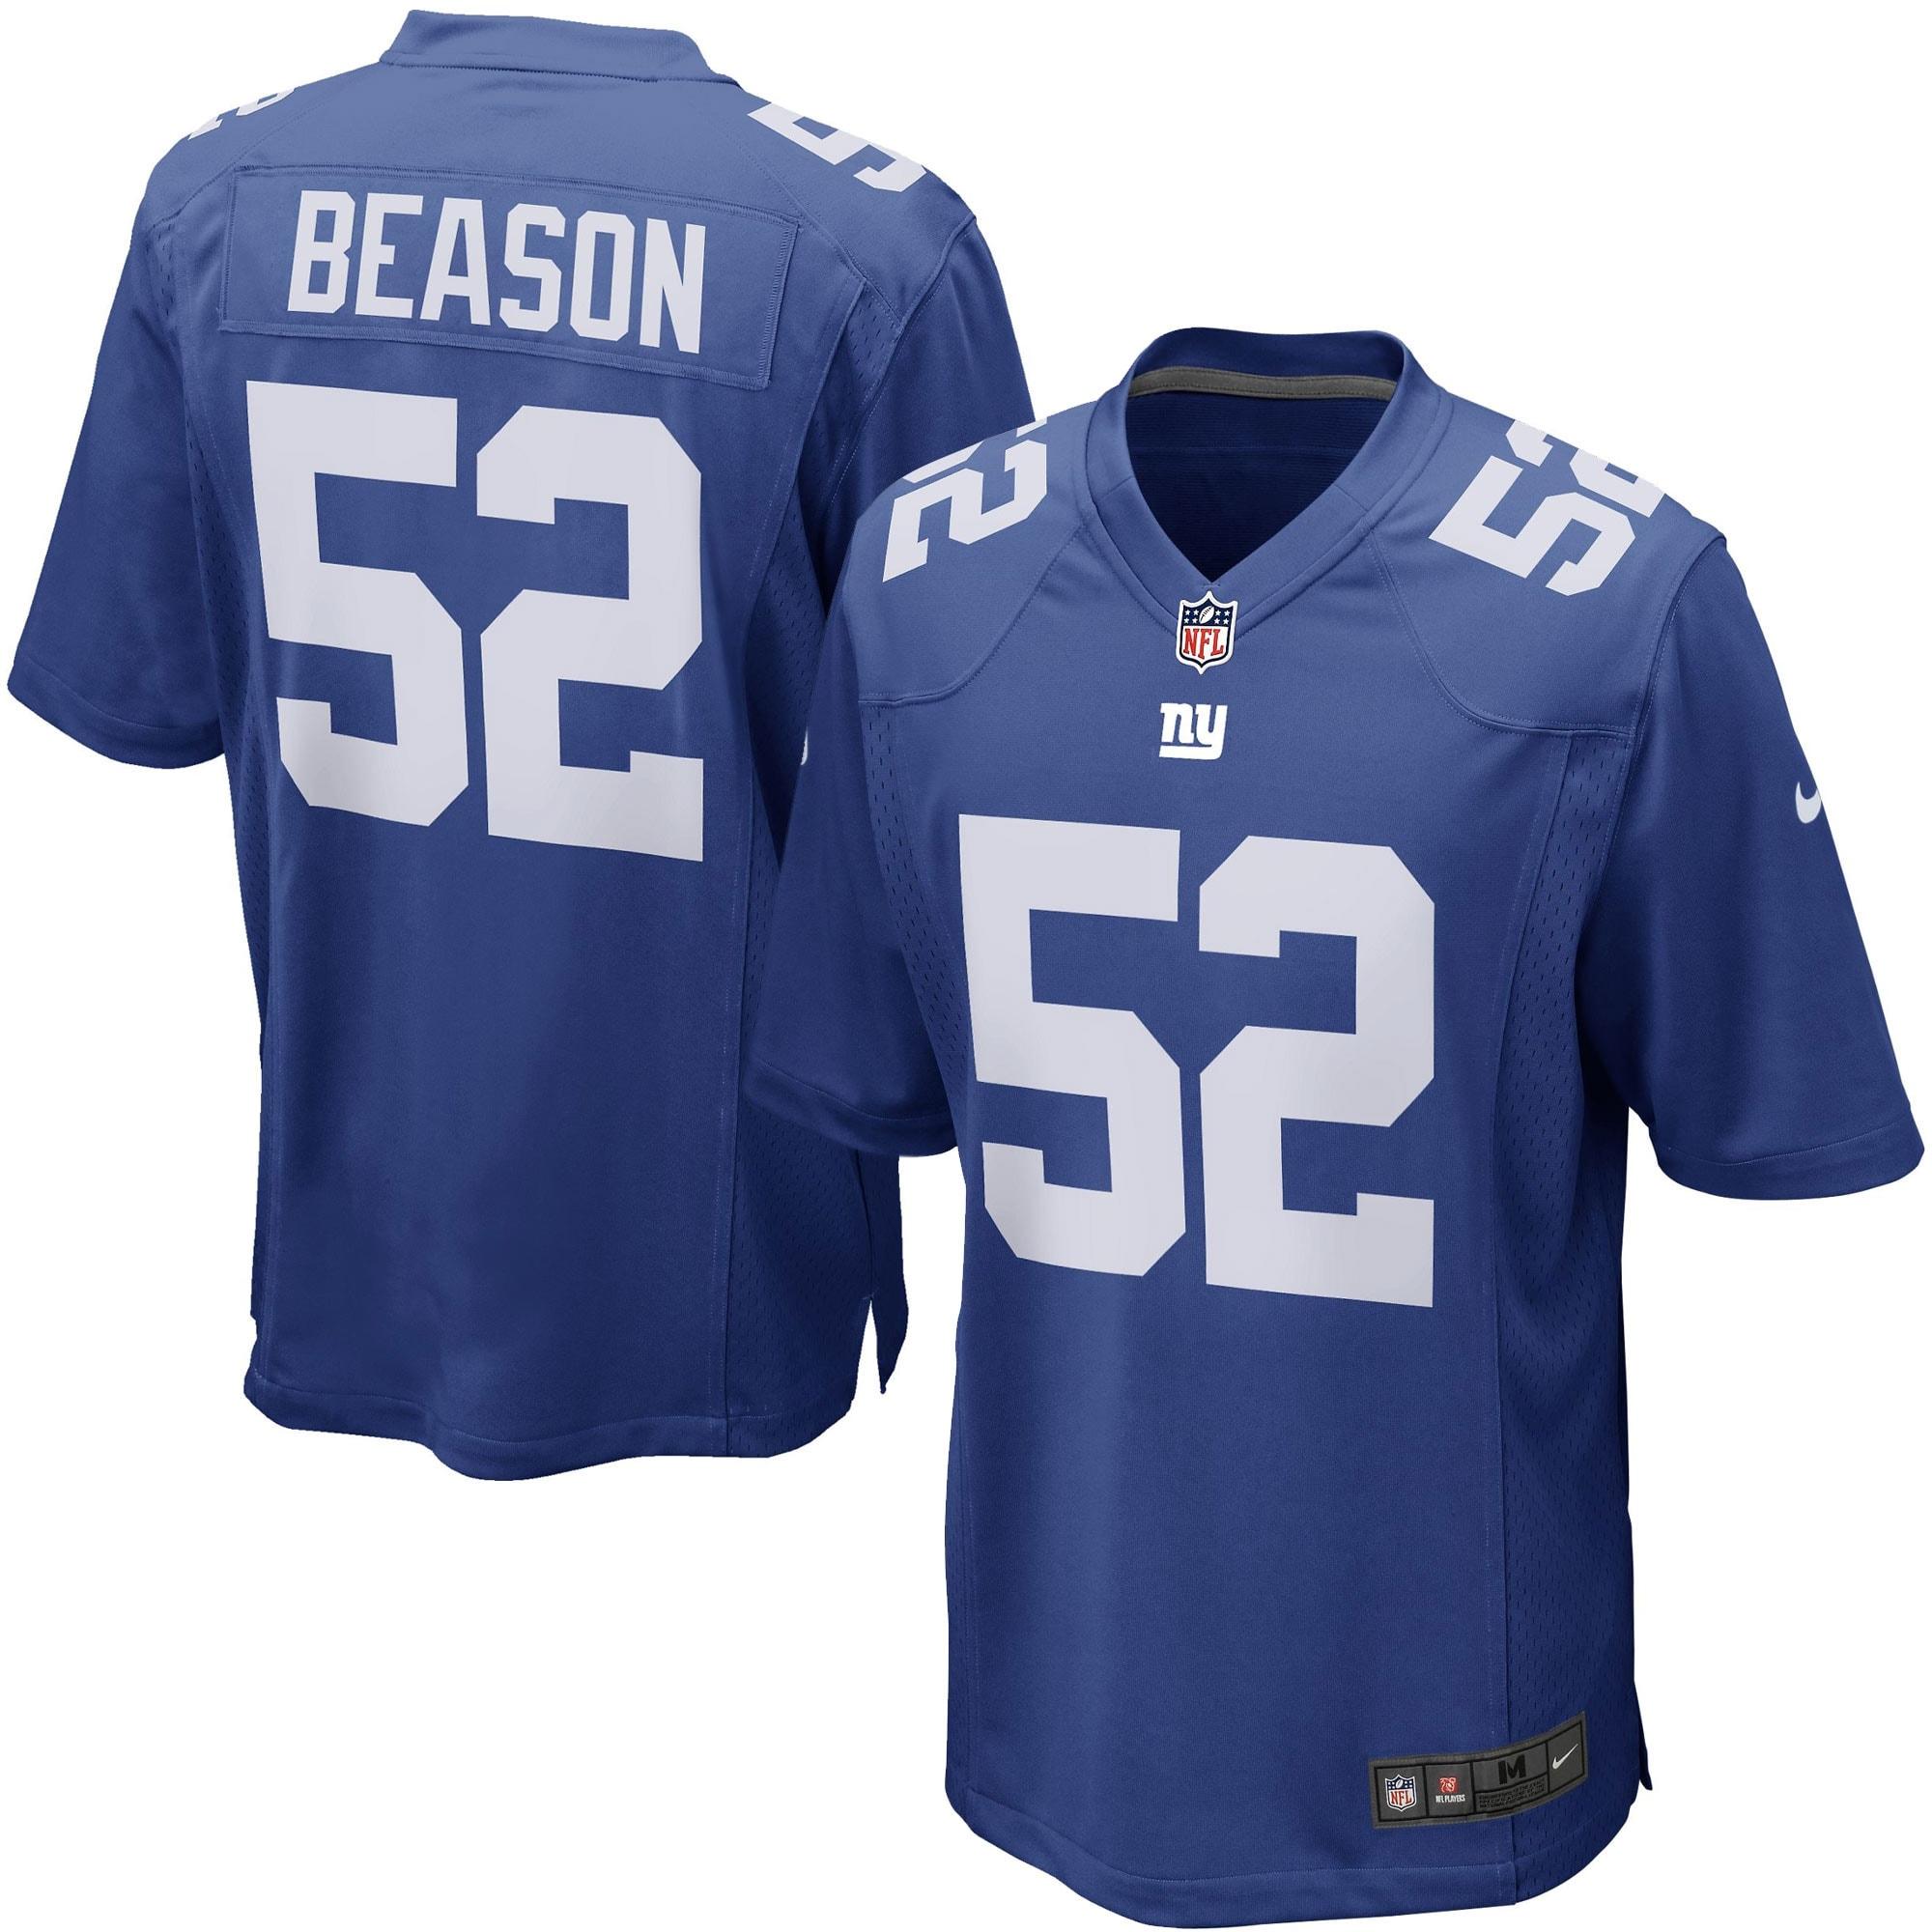 Jon Beason New York Giants Nike Game Jersey - Royal Blue